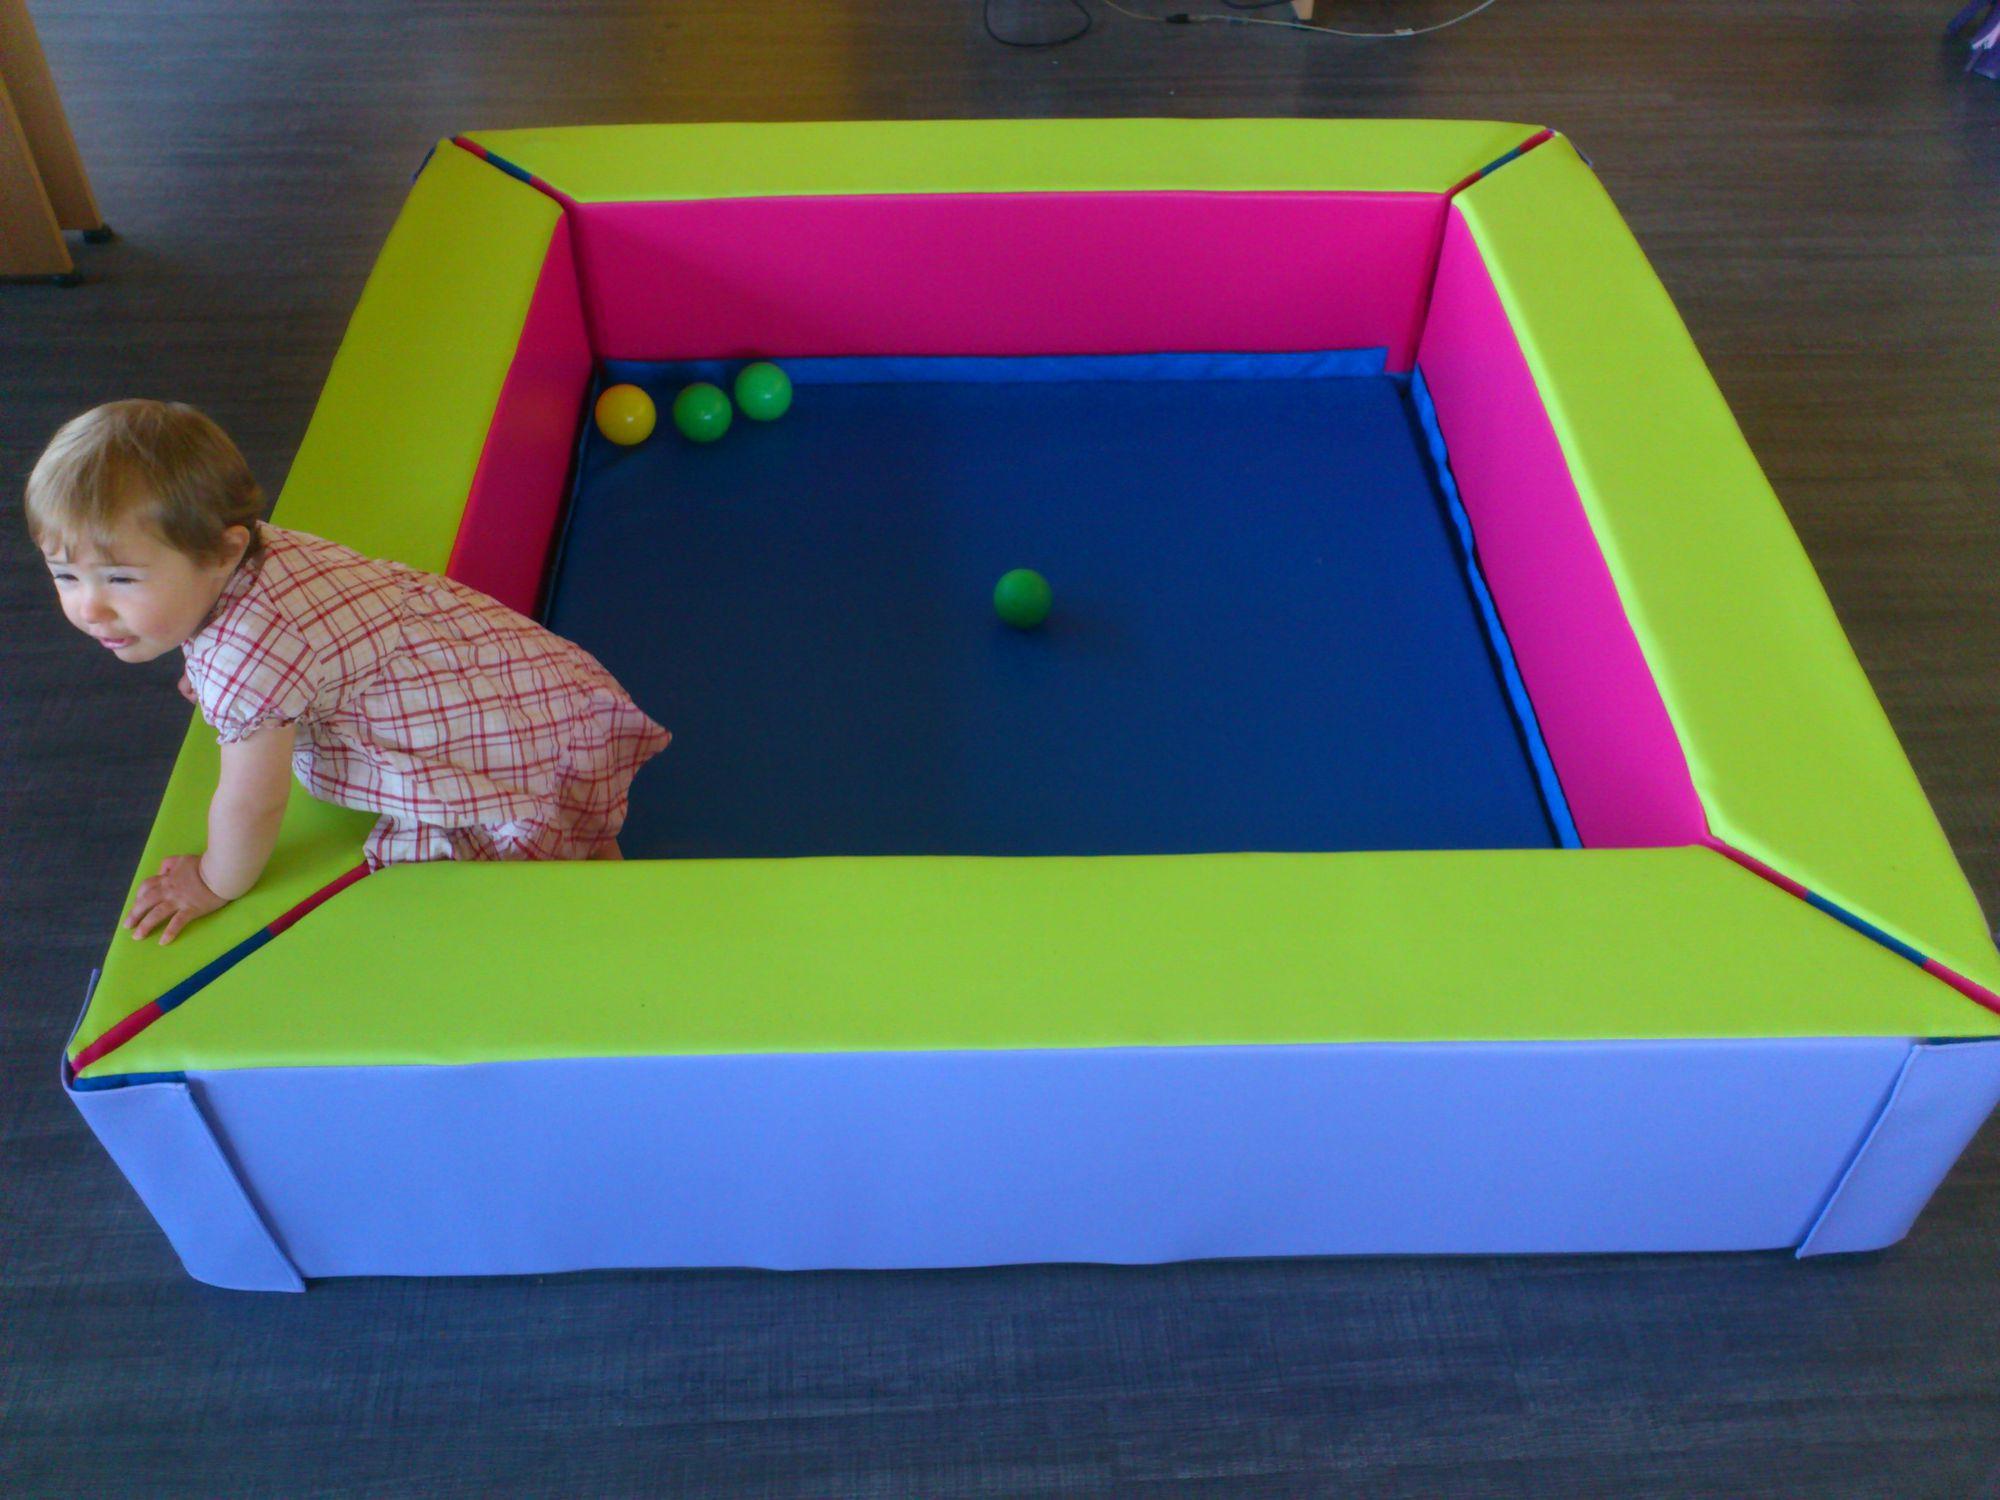 Foam For Motricity Ball Pool - Piscine À Balle Tapis De Fond ... concernant Piscine À Balle